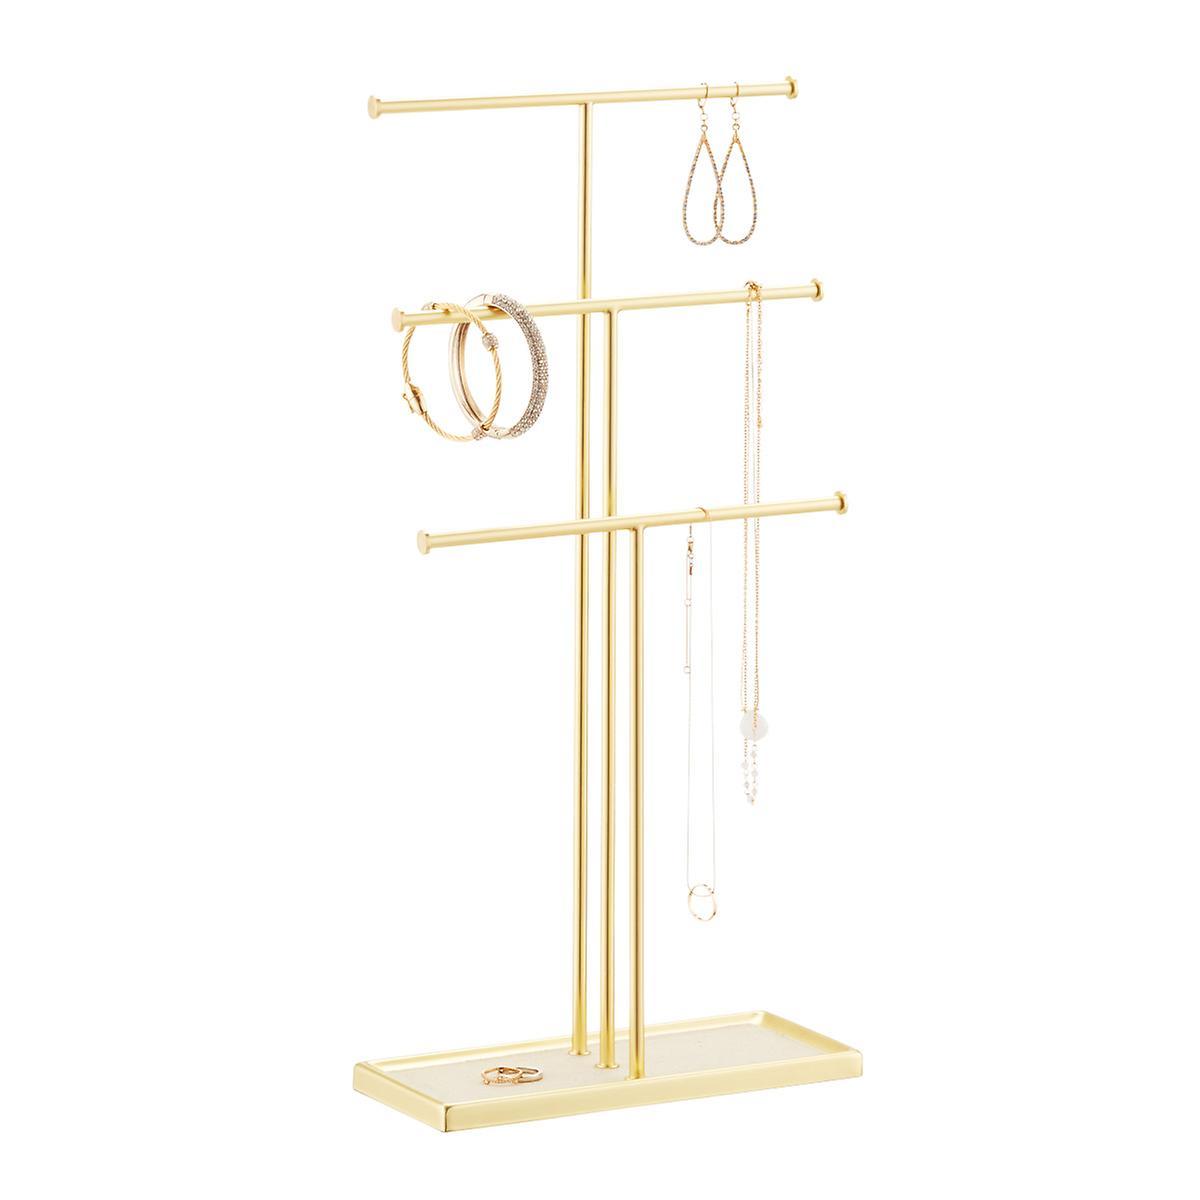 Umbra Gold Tribeca Necklace Stand